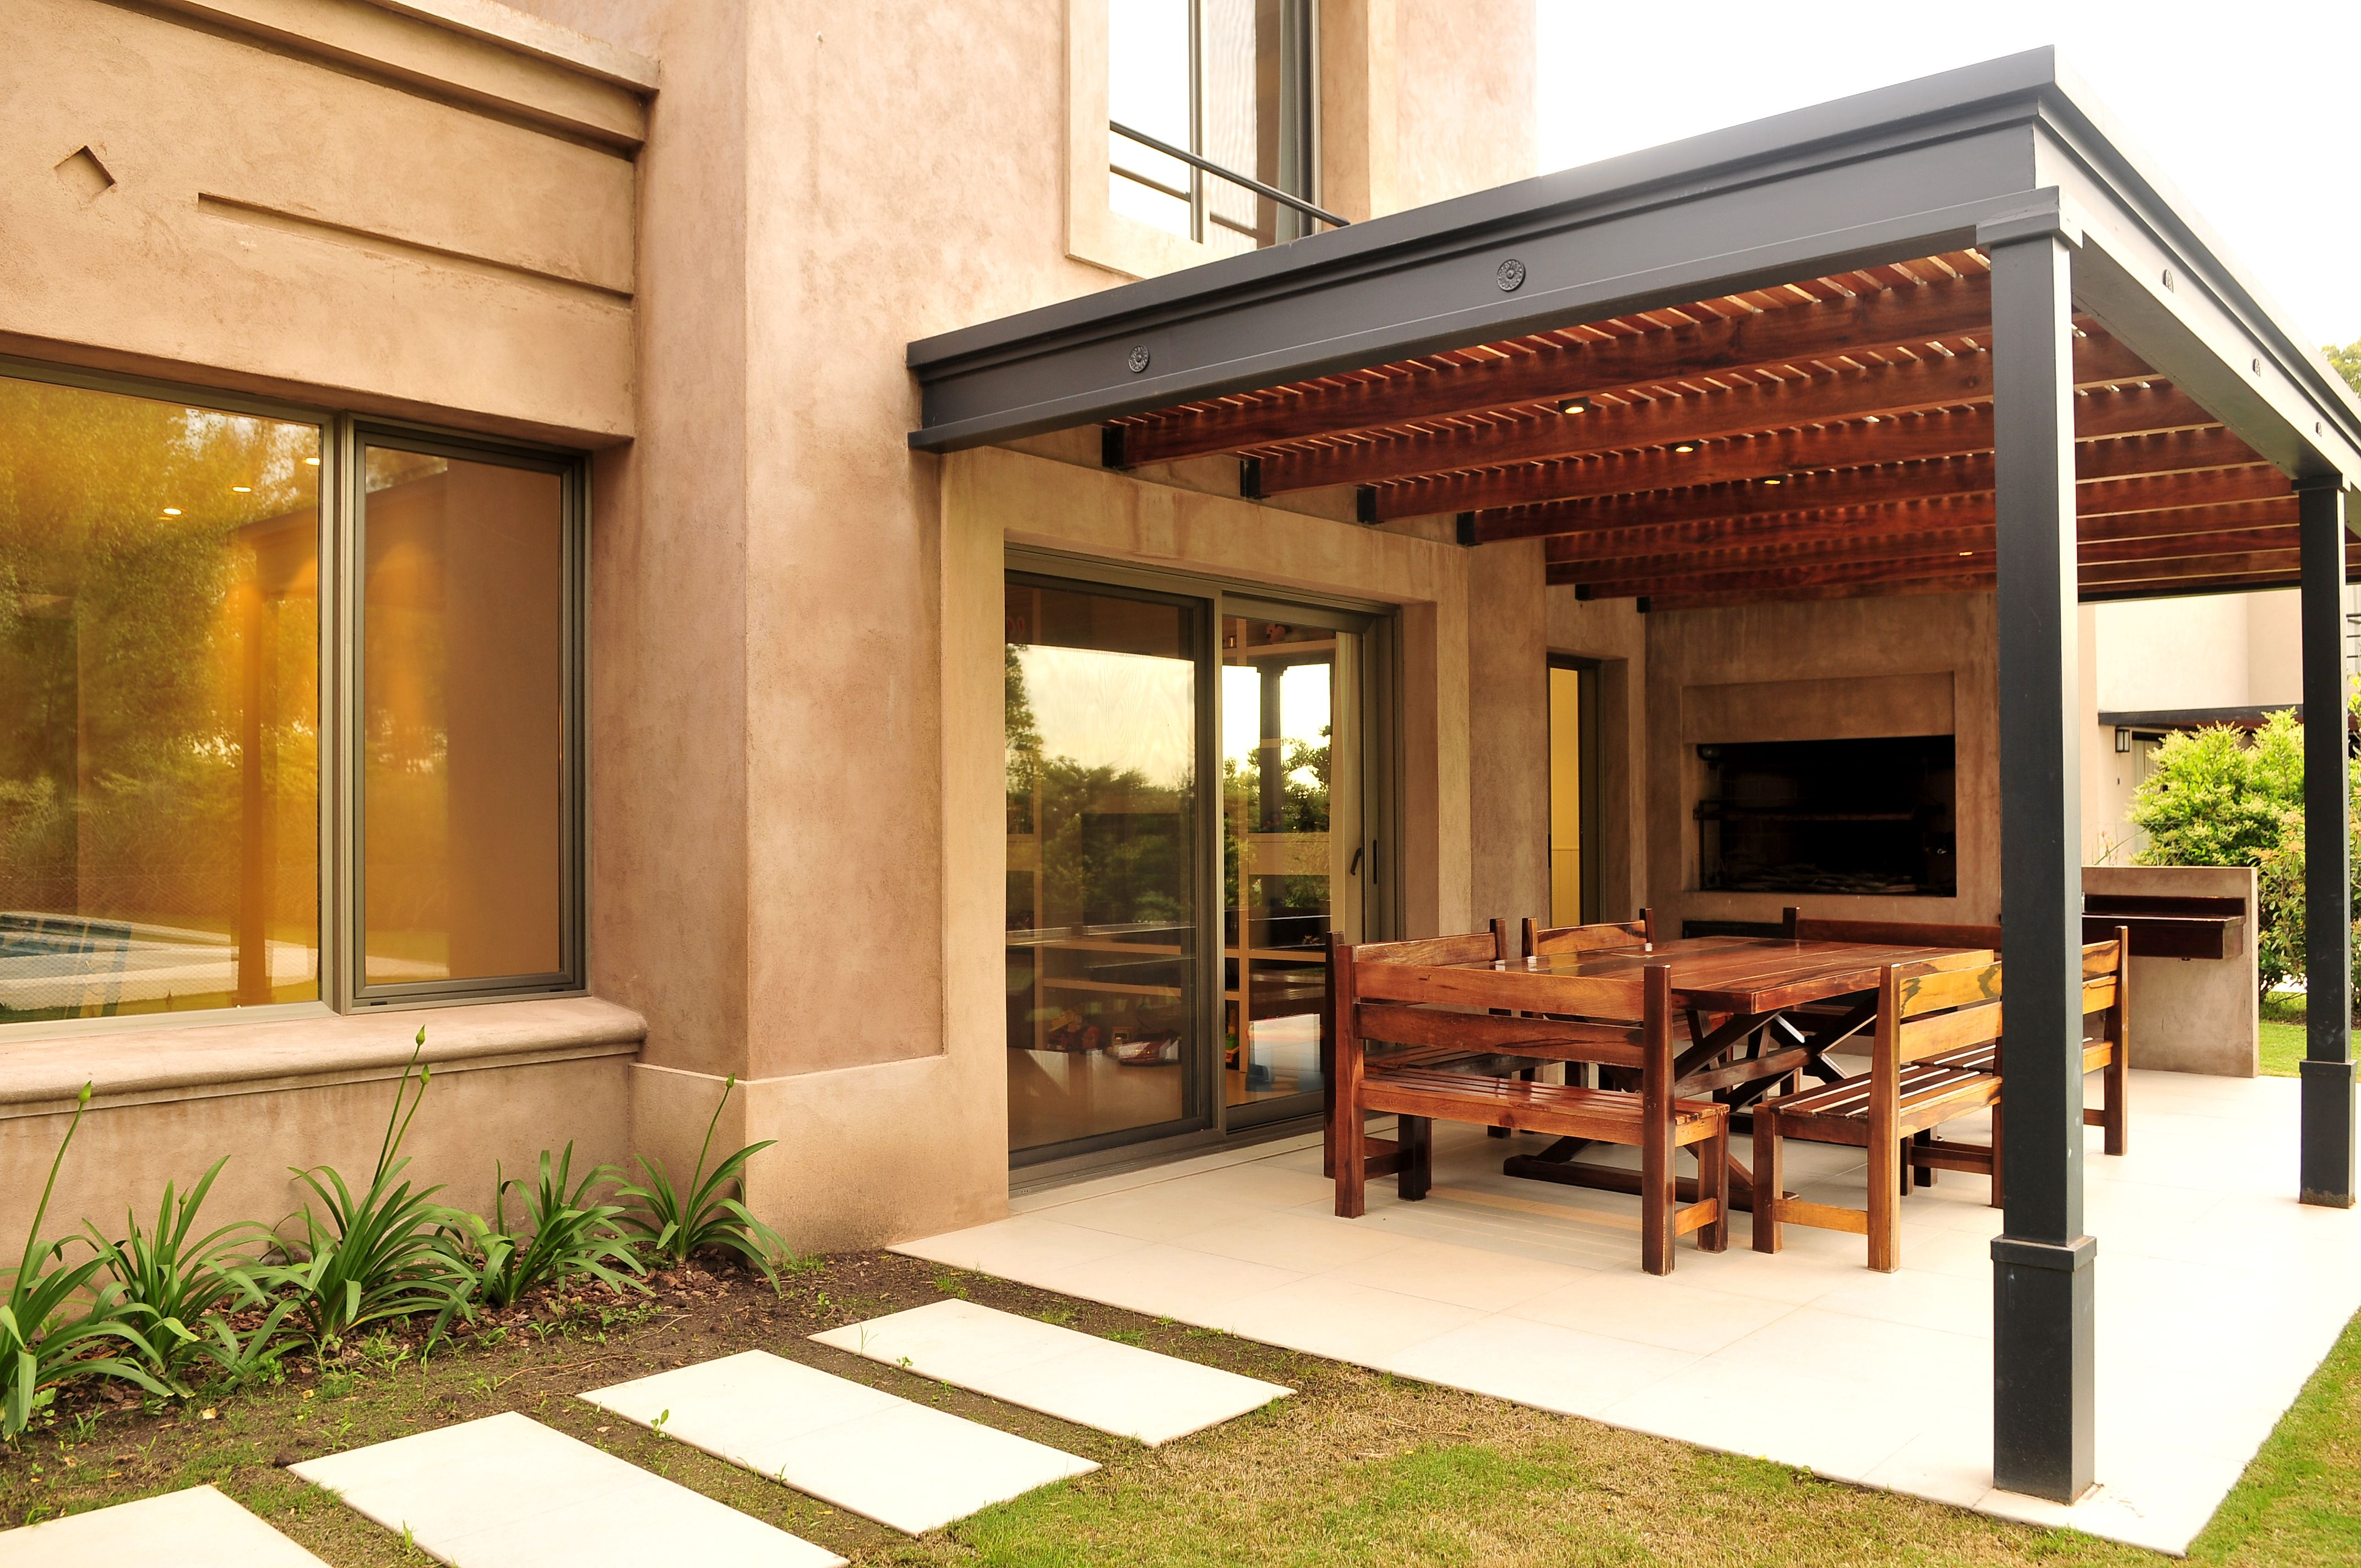 Outdoor garage decorations  Galeria caro pereyra  casa campo  Pinterest  Pergolas Patios and